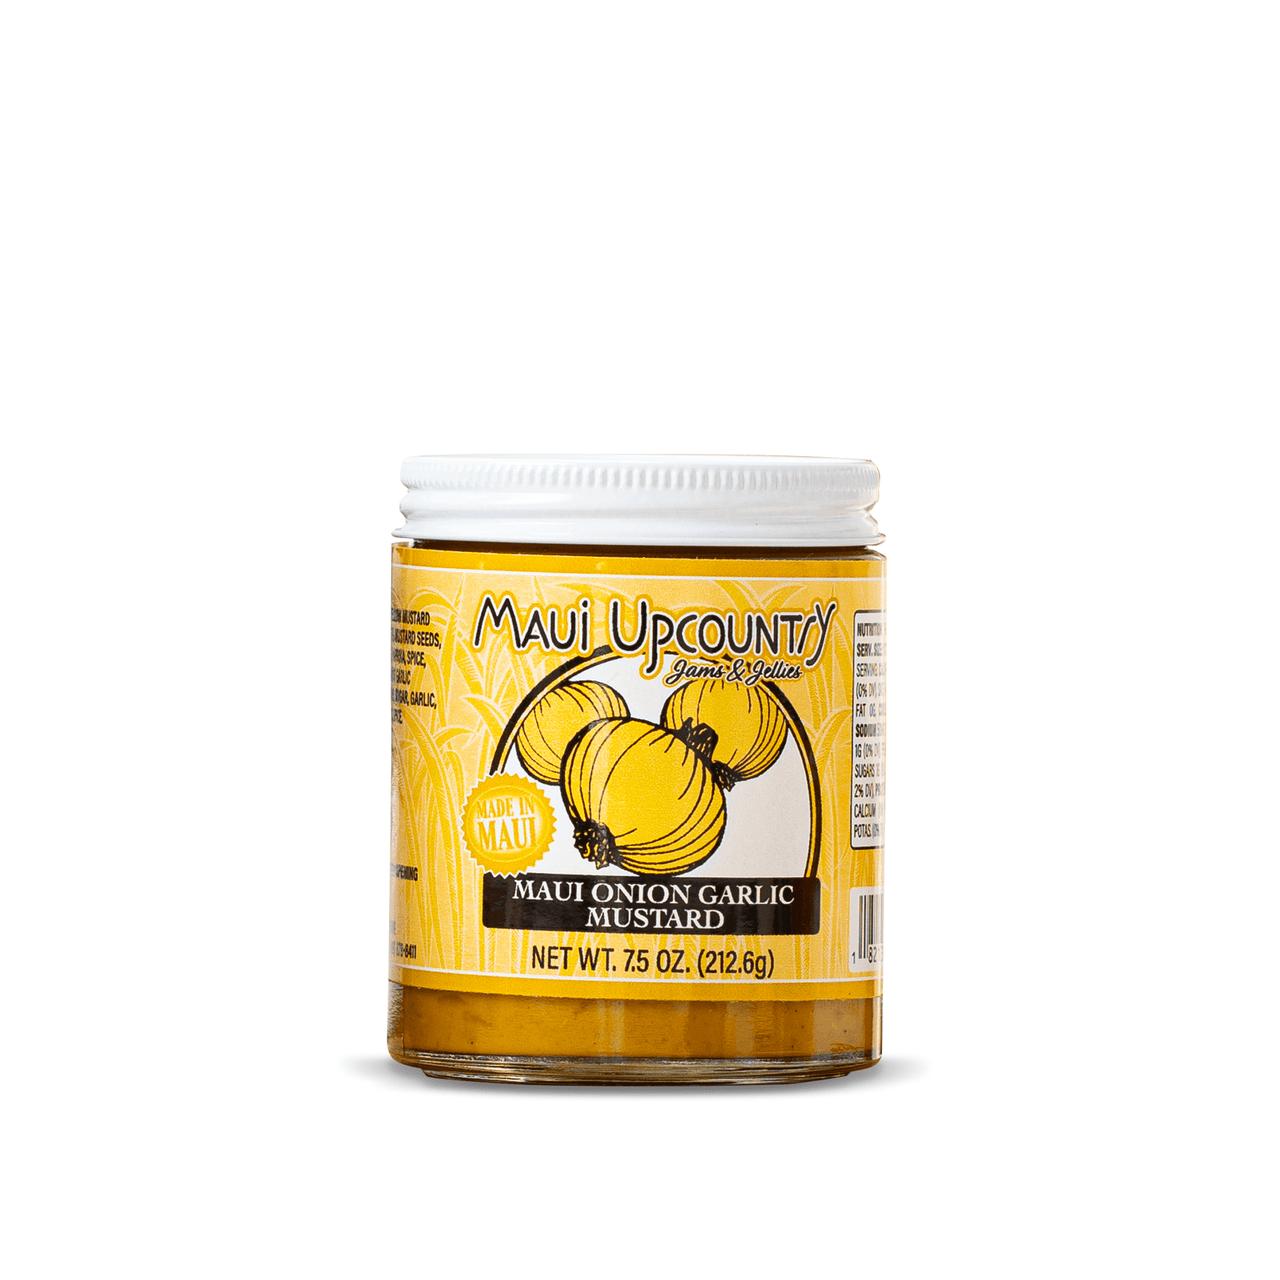 Maui Upcountry Maui Onion &  Garlic Mustard, 7.5 oz